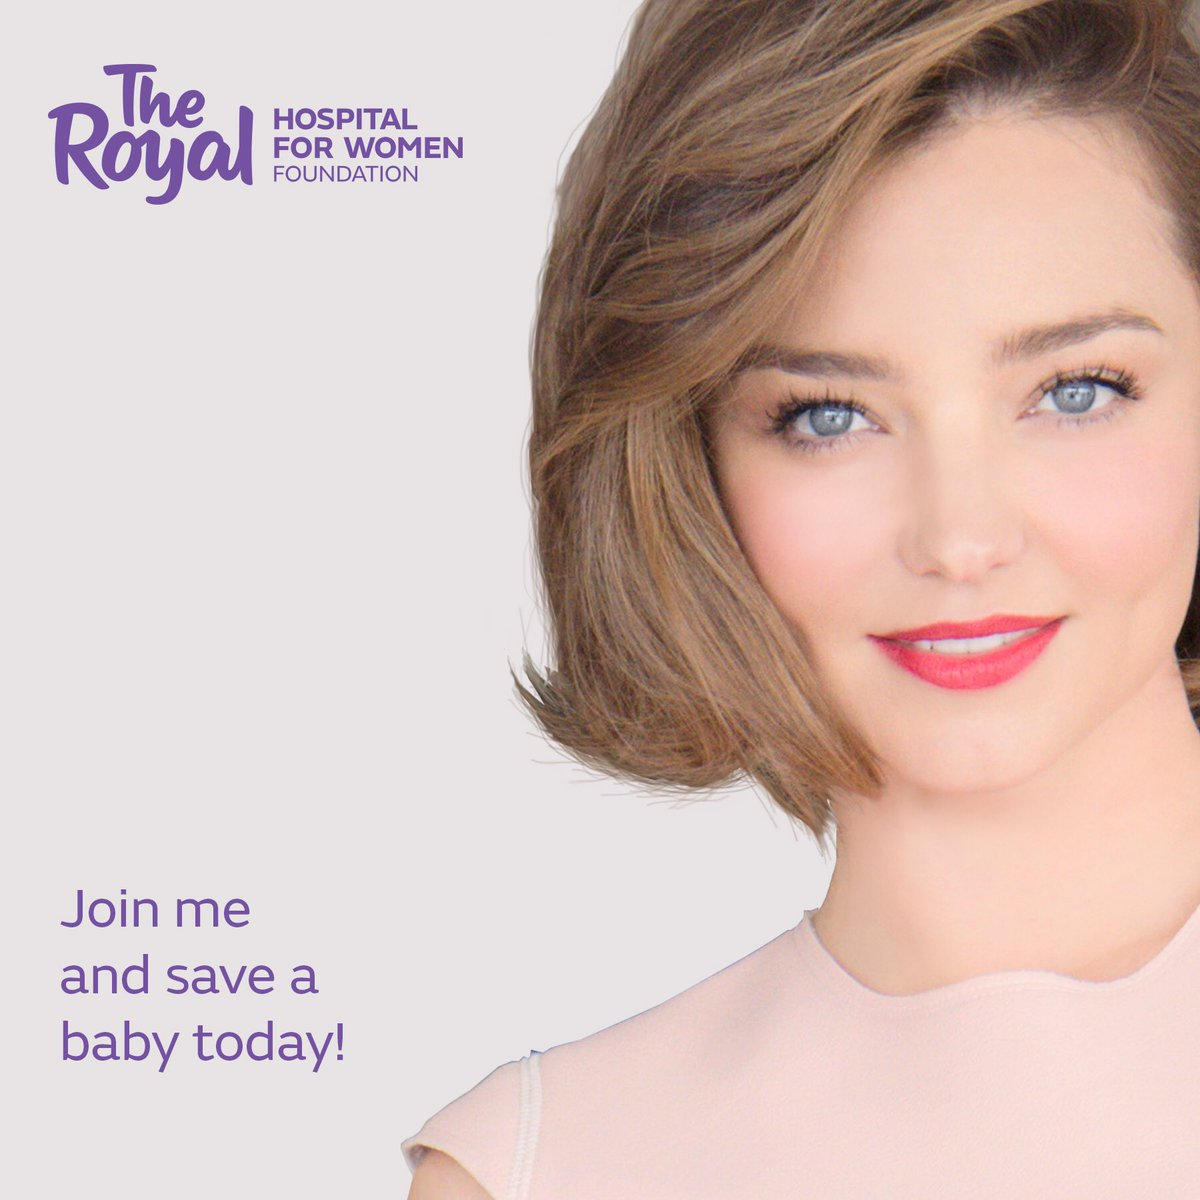 Proud 2 b ambassador 4 @royalforwomen. I was a premature baby myself & was saved.Donate @ https://t.co/RX8BImk0bd https://t.co/b0OxIltmdc